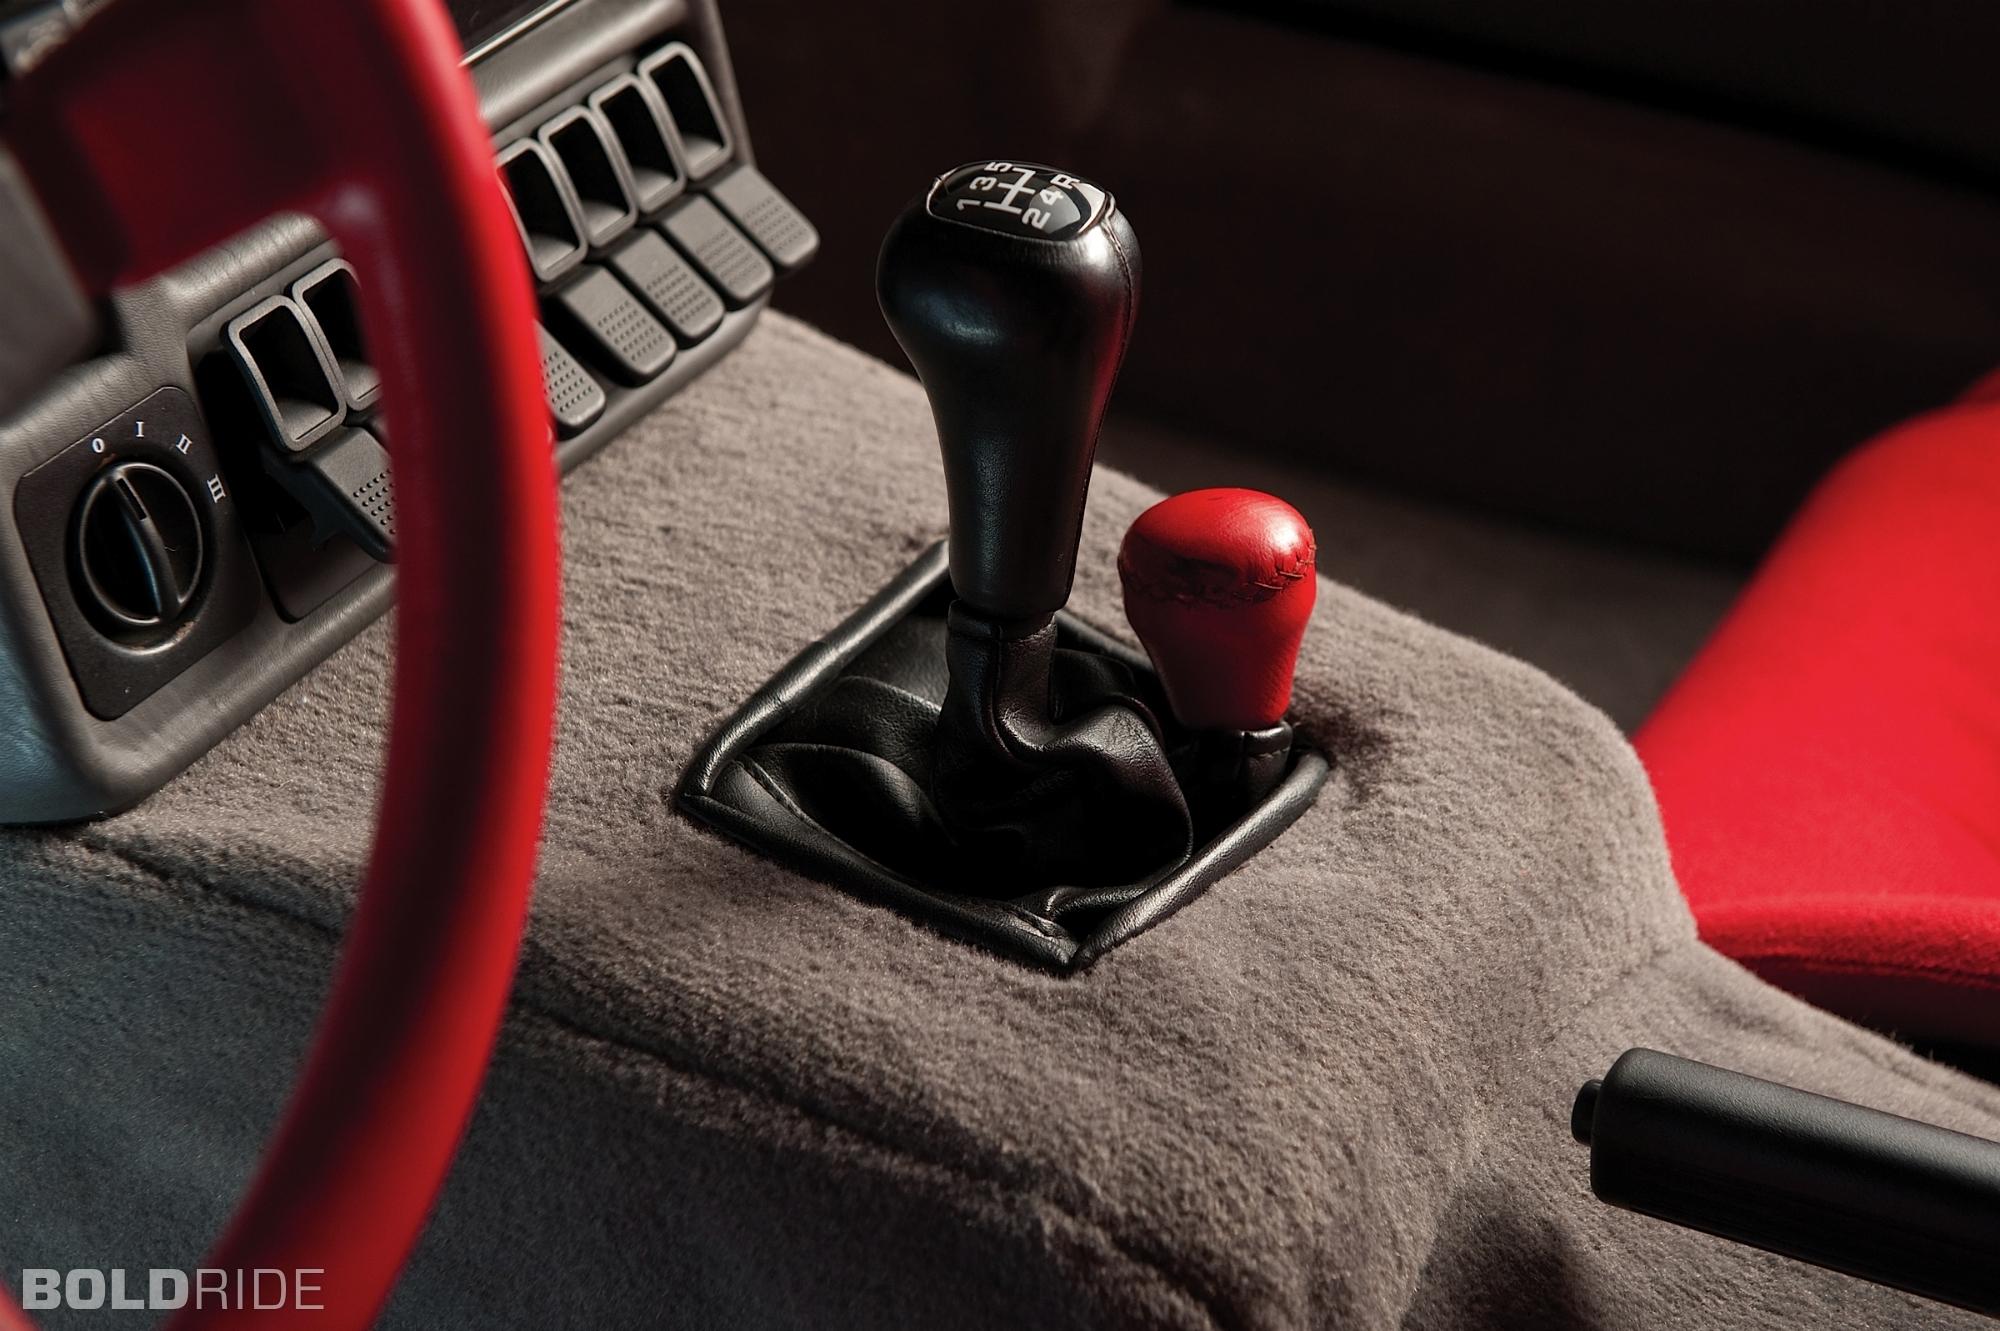 ford-rs200-evolution.2000x1331.Jan-04-2012_21.28.21.526747.jpg